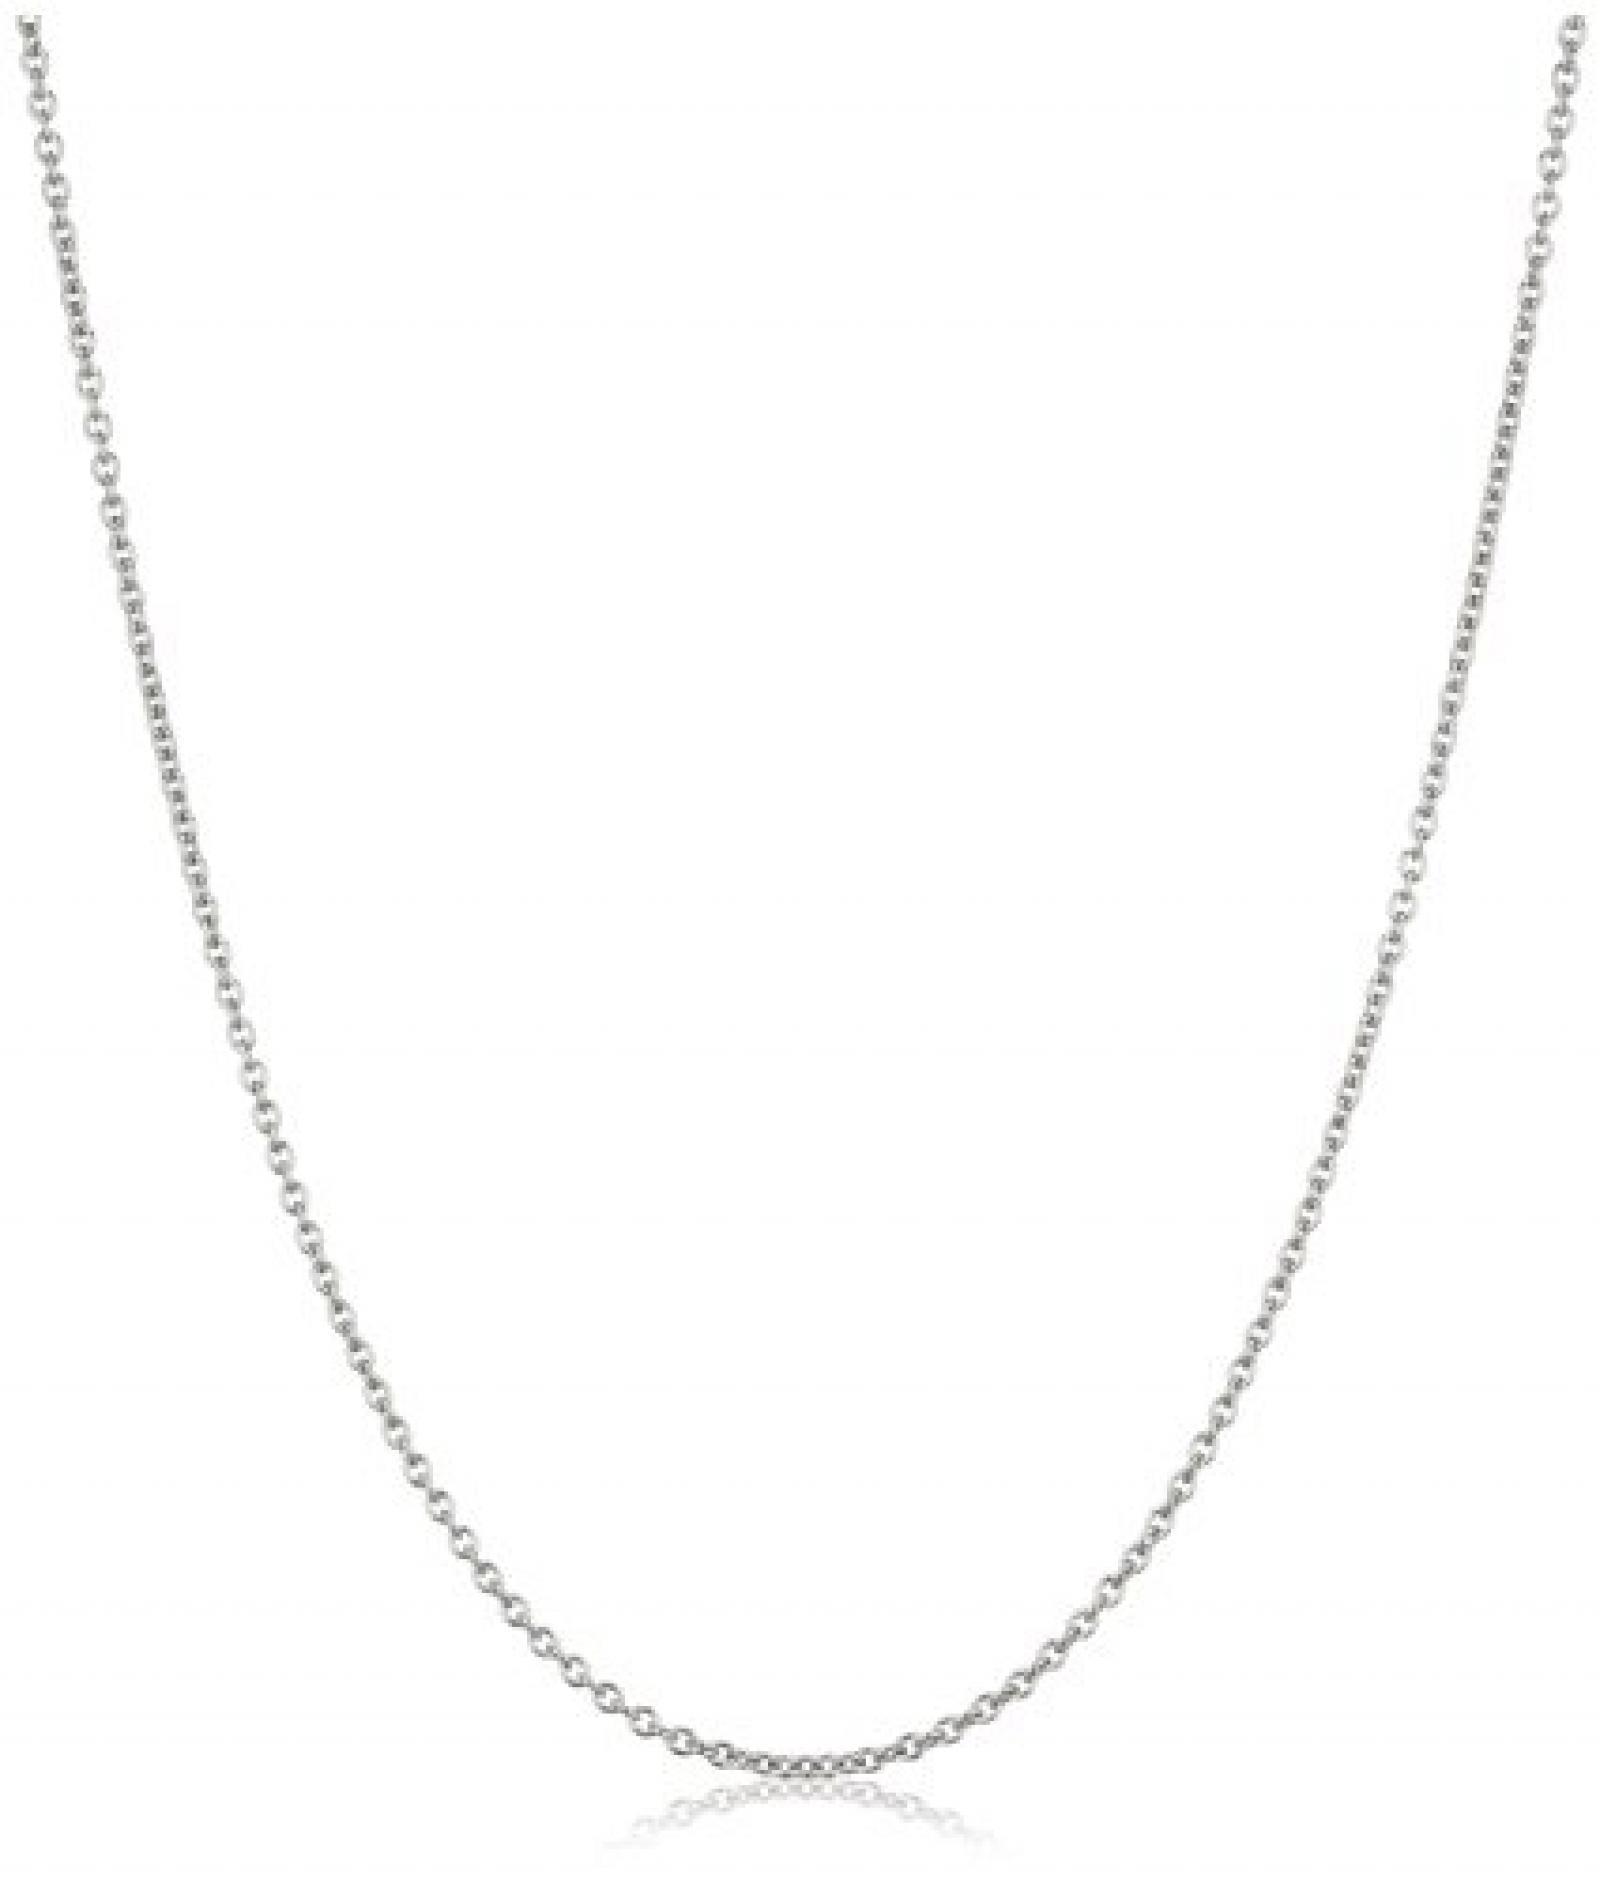 Dyrberg/Kern Damen-Halskette Priam 90 Shiny Silber 332374